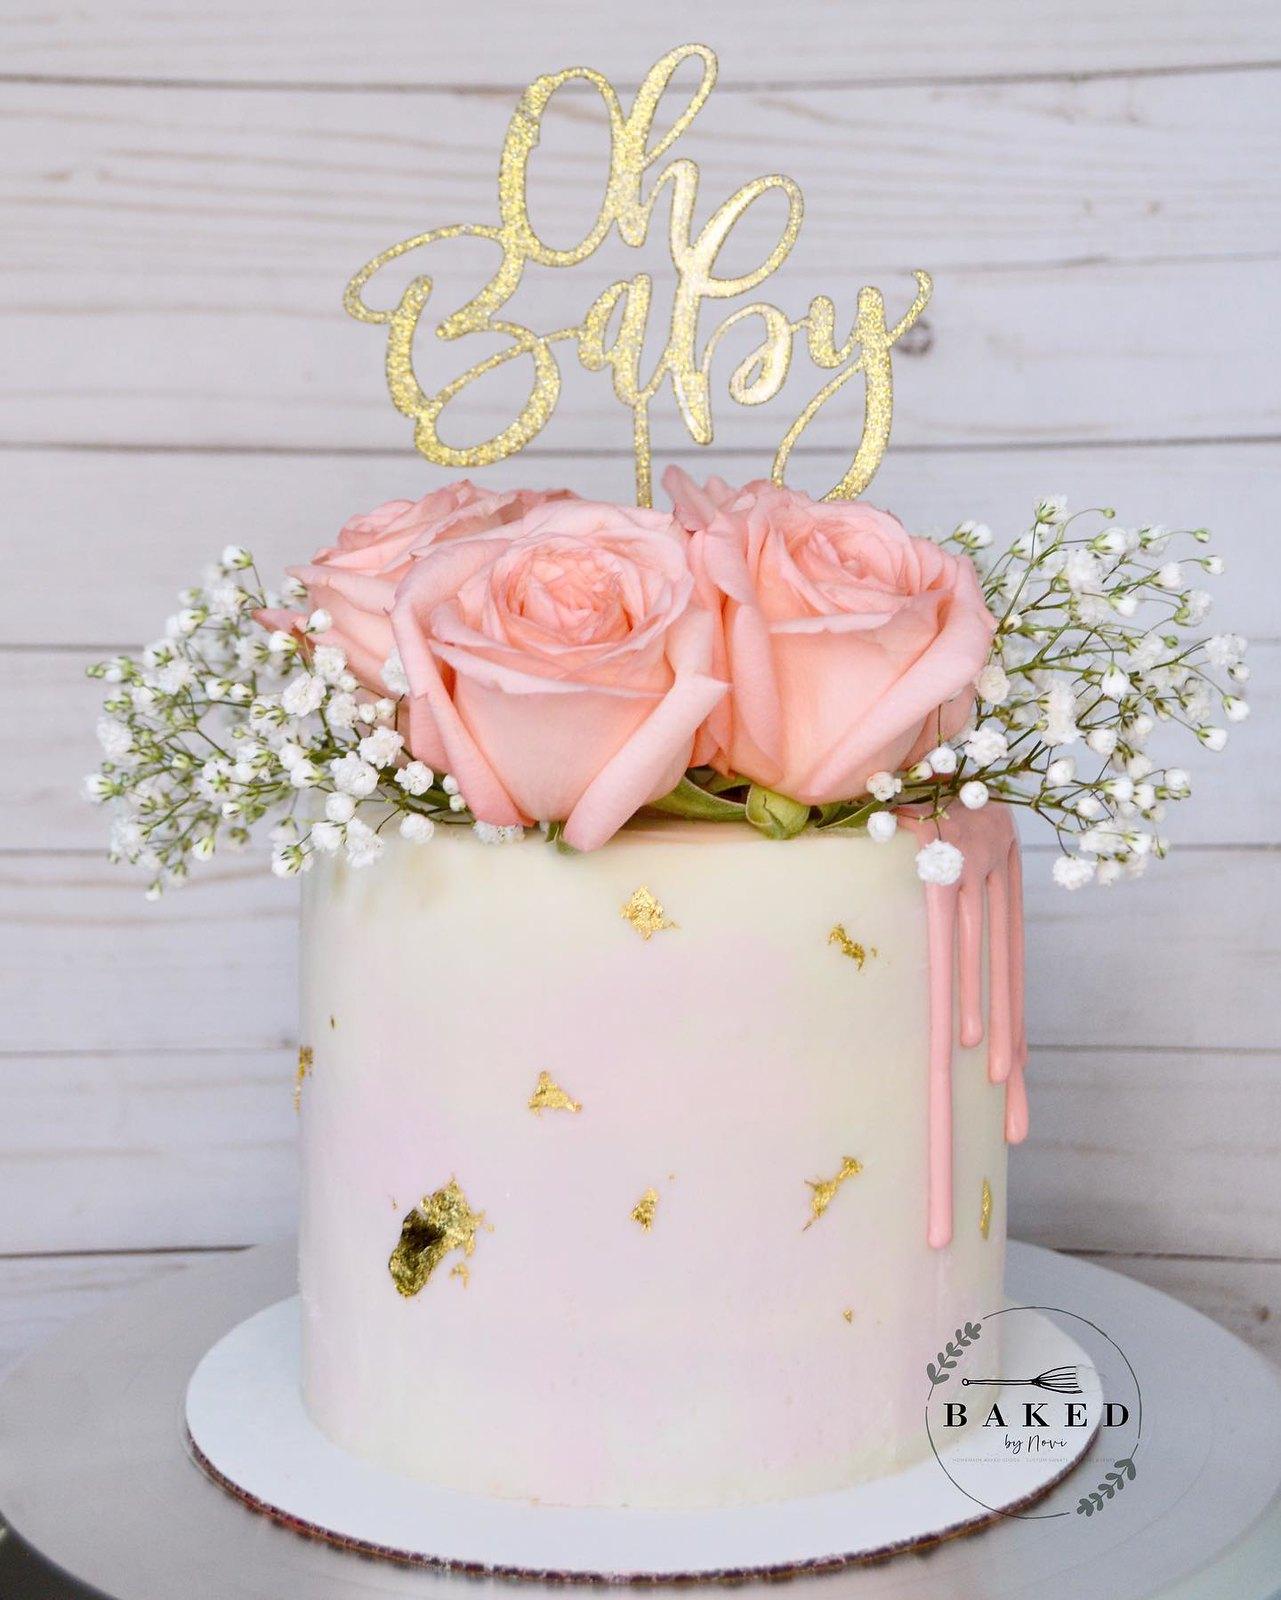 Cake from Baked by Novi